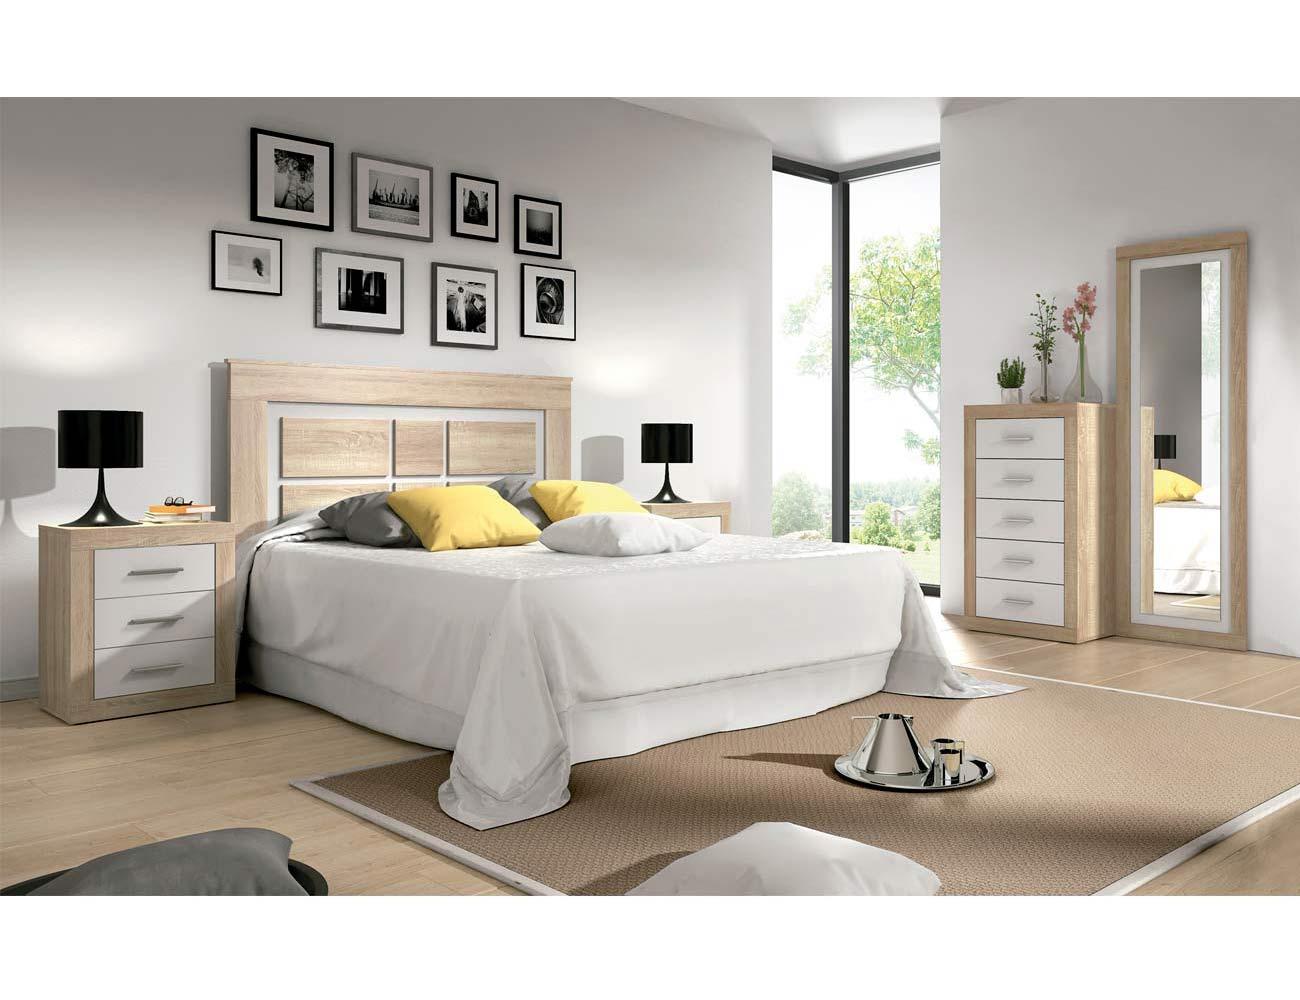 02 dormitorio matrimonio sinfonier cambrian blanco